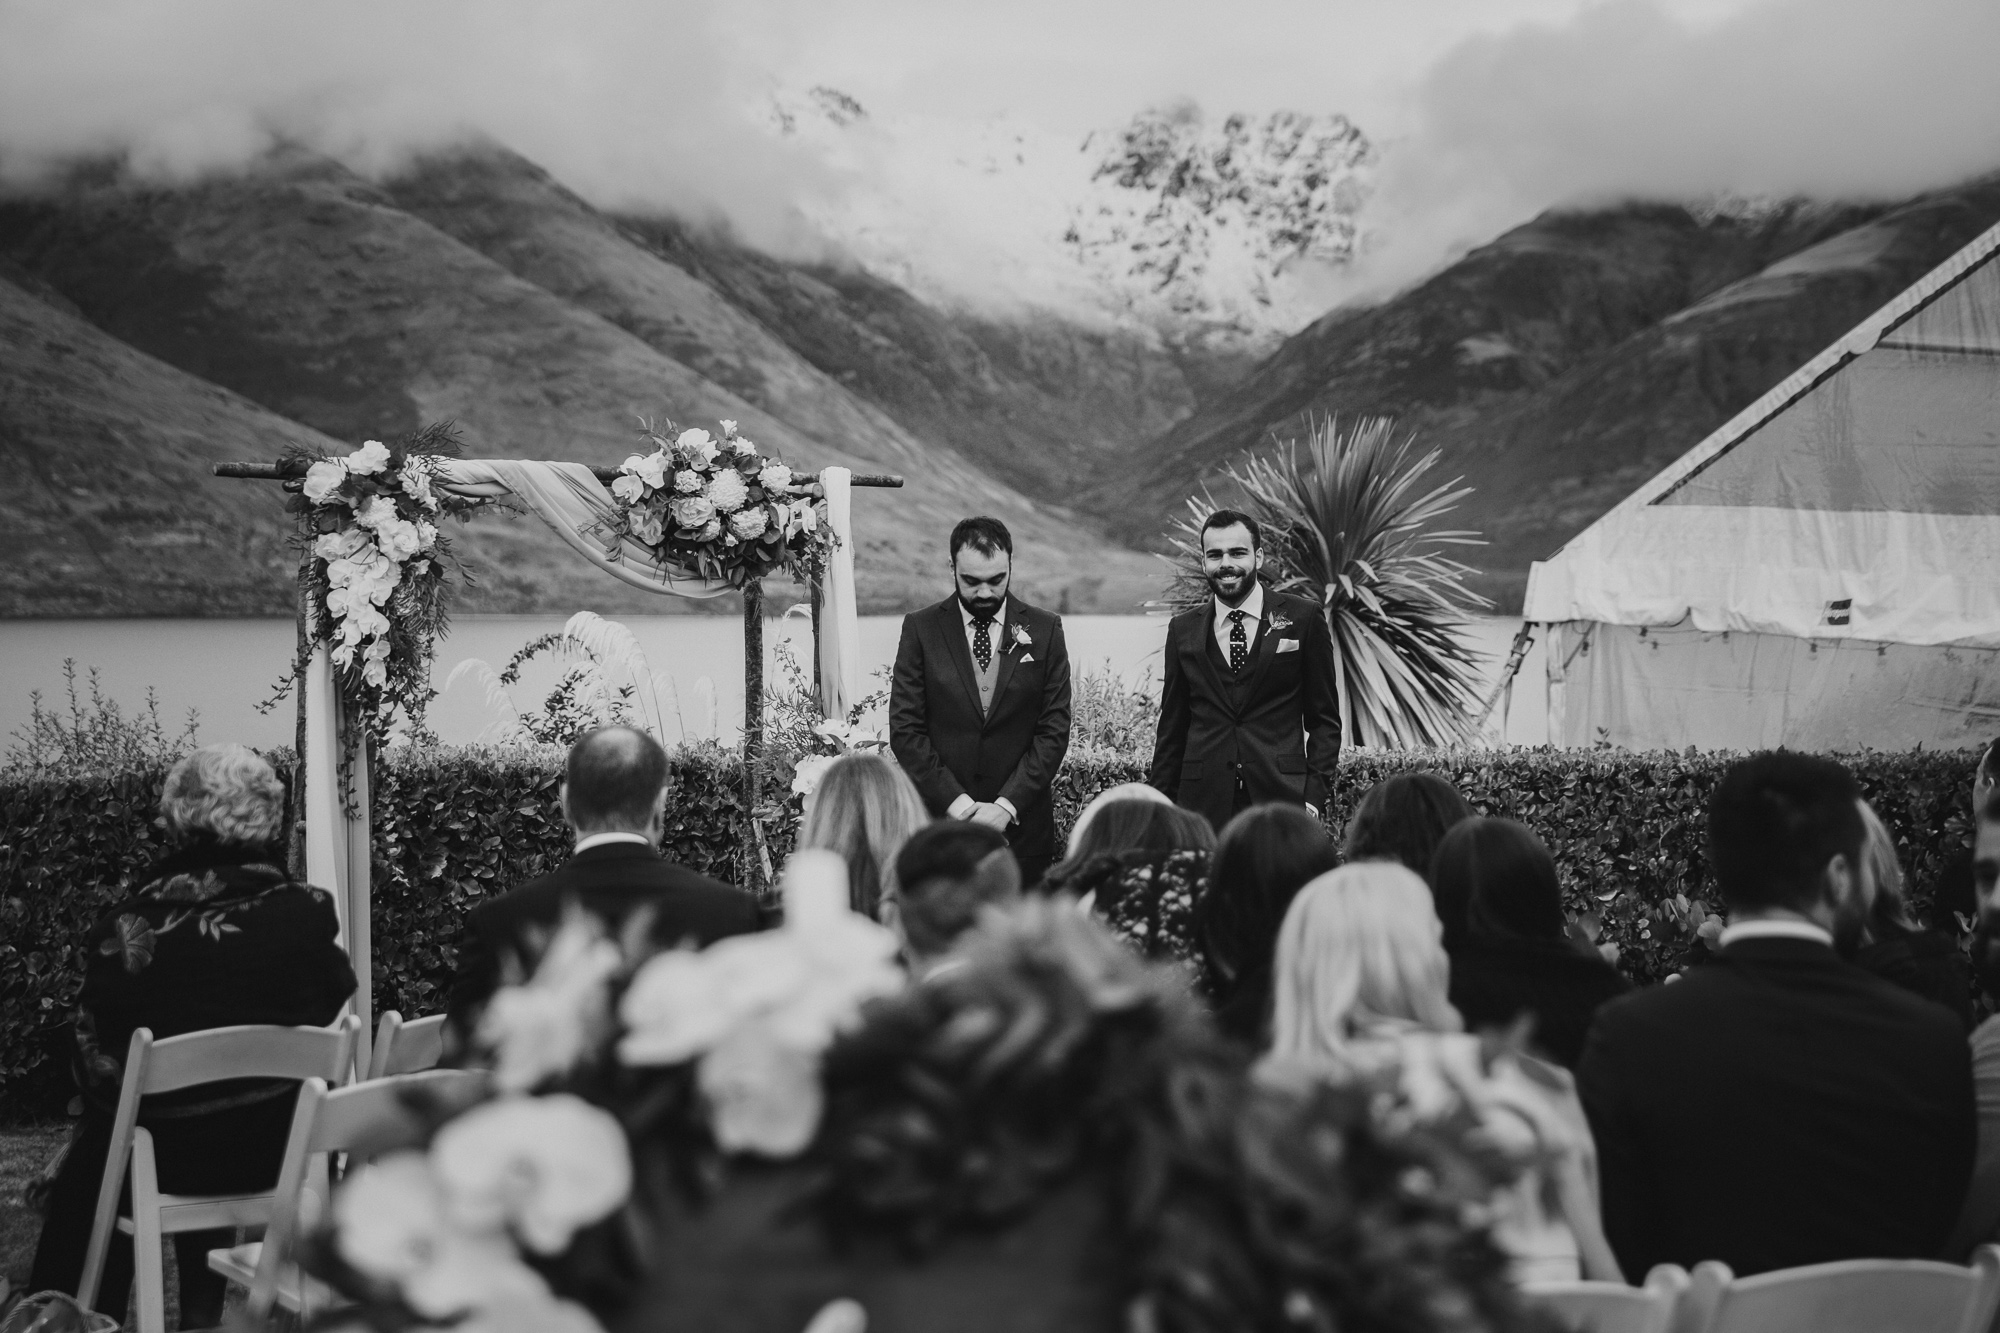 Matakauri Lodge winter wedding in Queenstown NZ